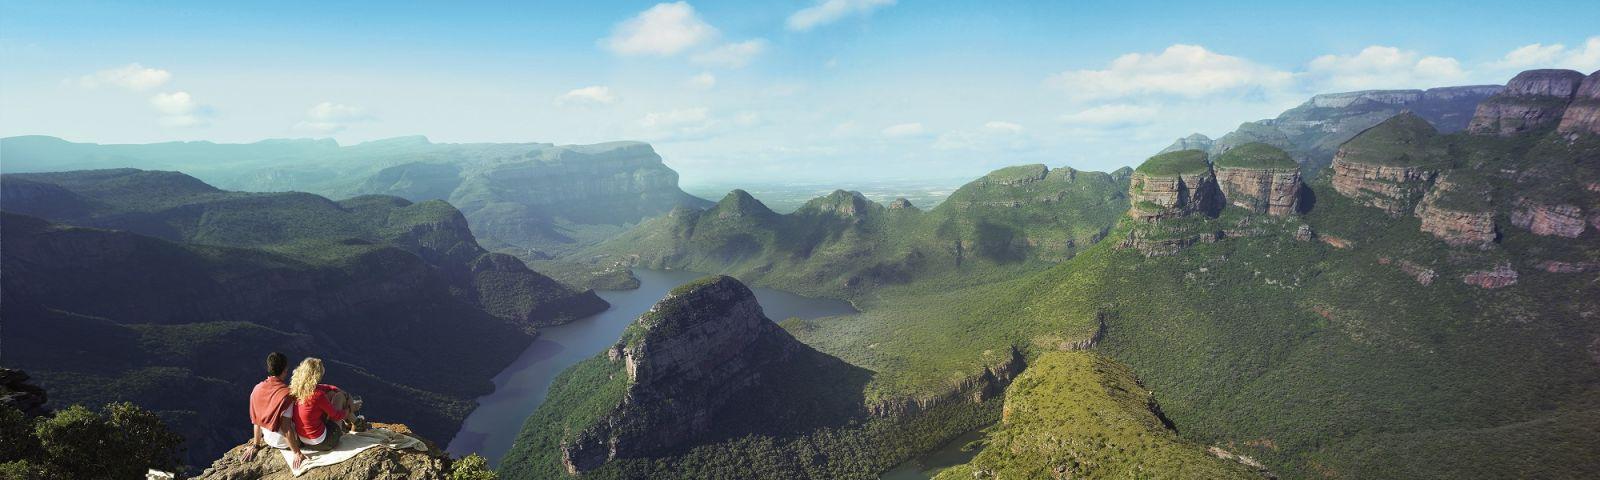 Landschaft in Südafrika bei strahlendem Wetter